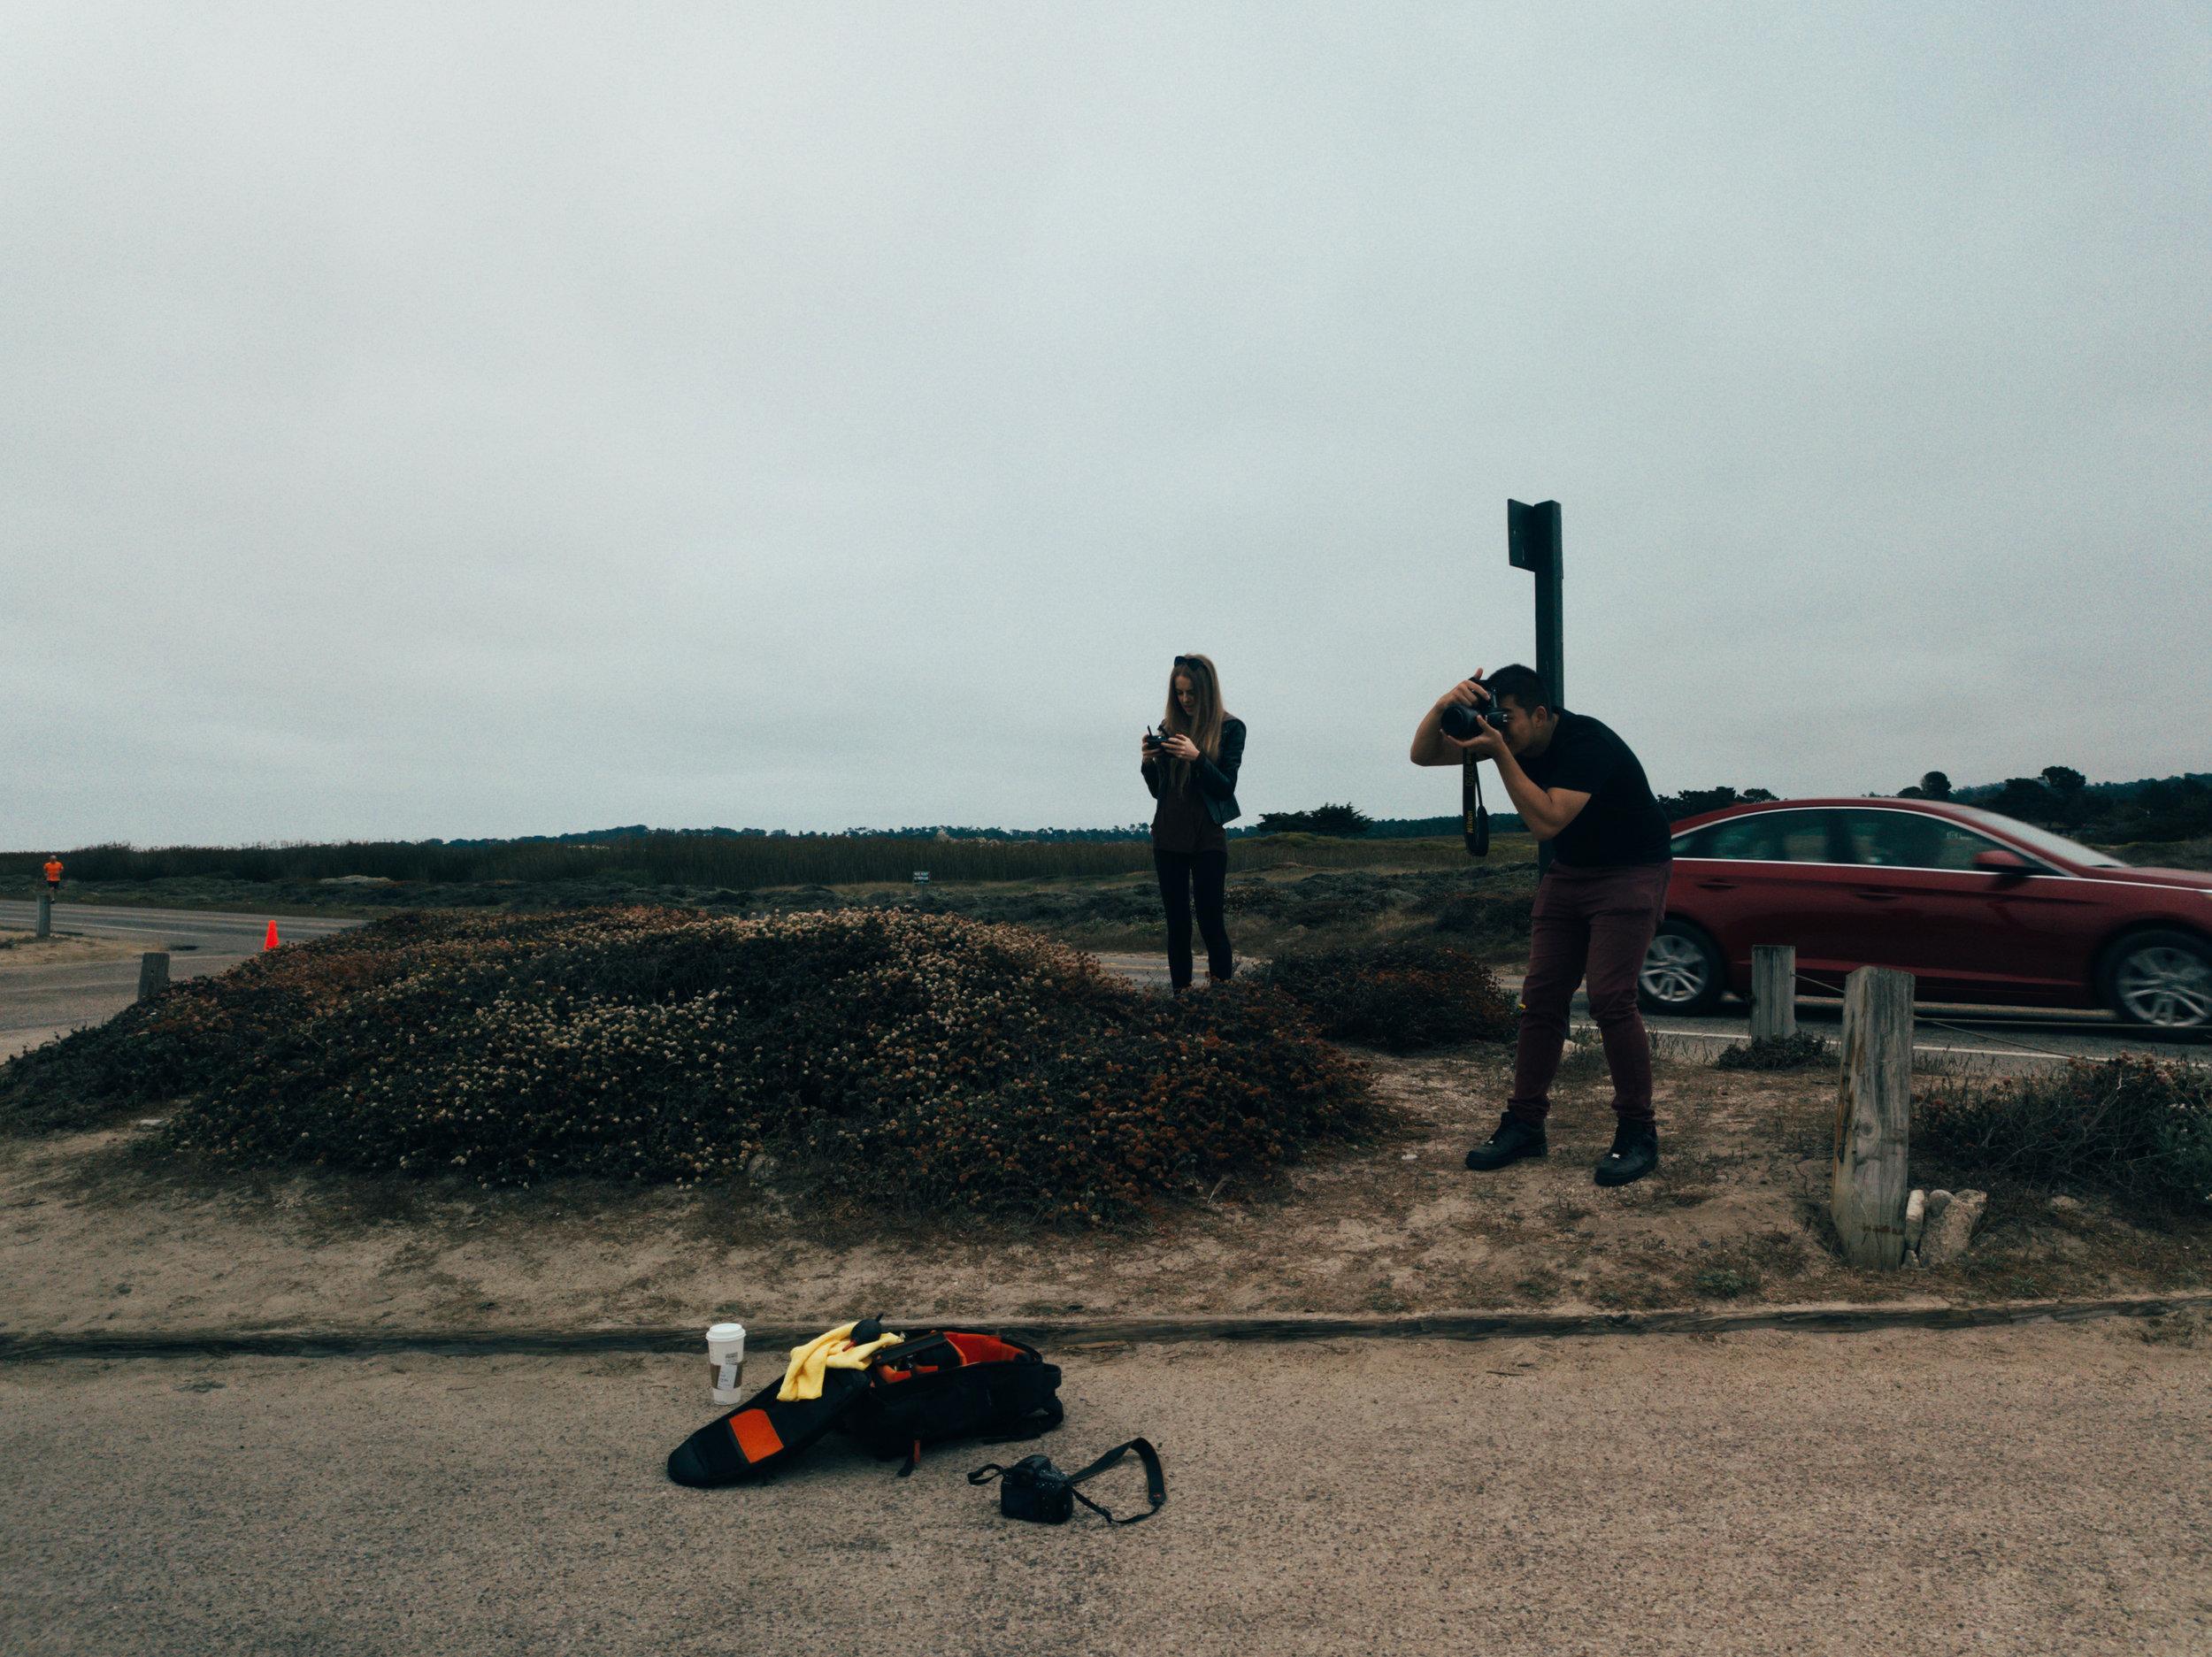 Stay_Driven_Monterey_Car_Week_Whitesse_Koenigsegg-4.jpg